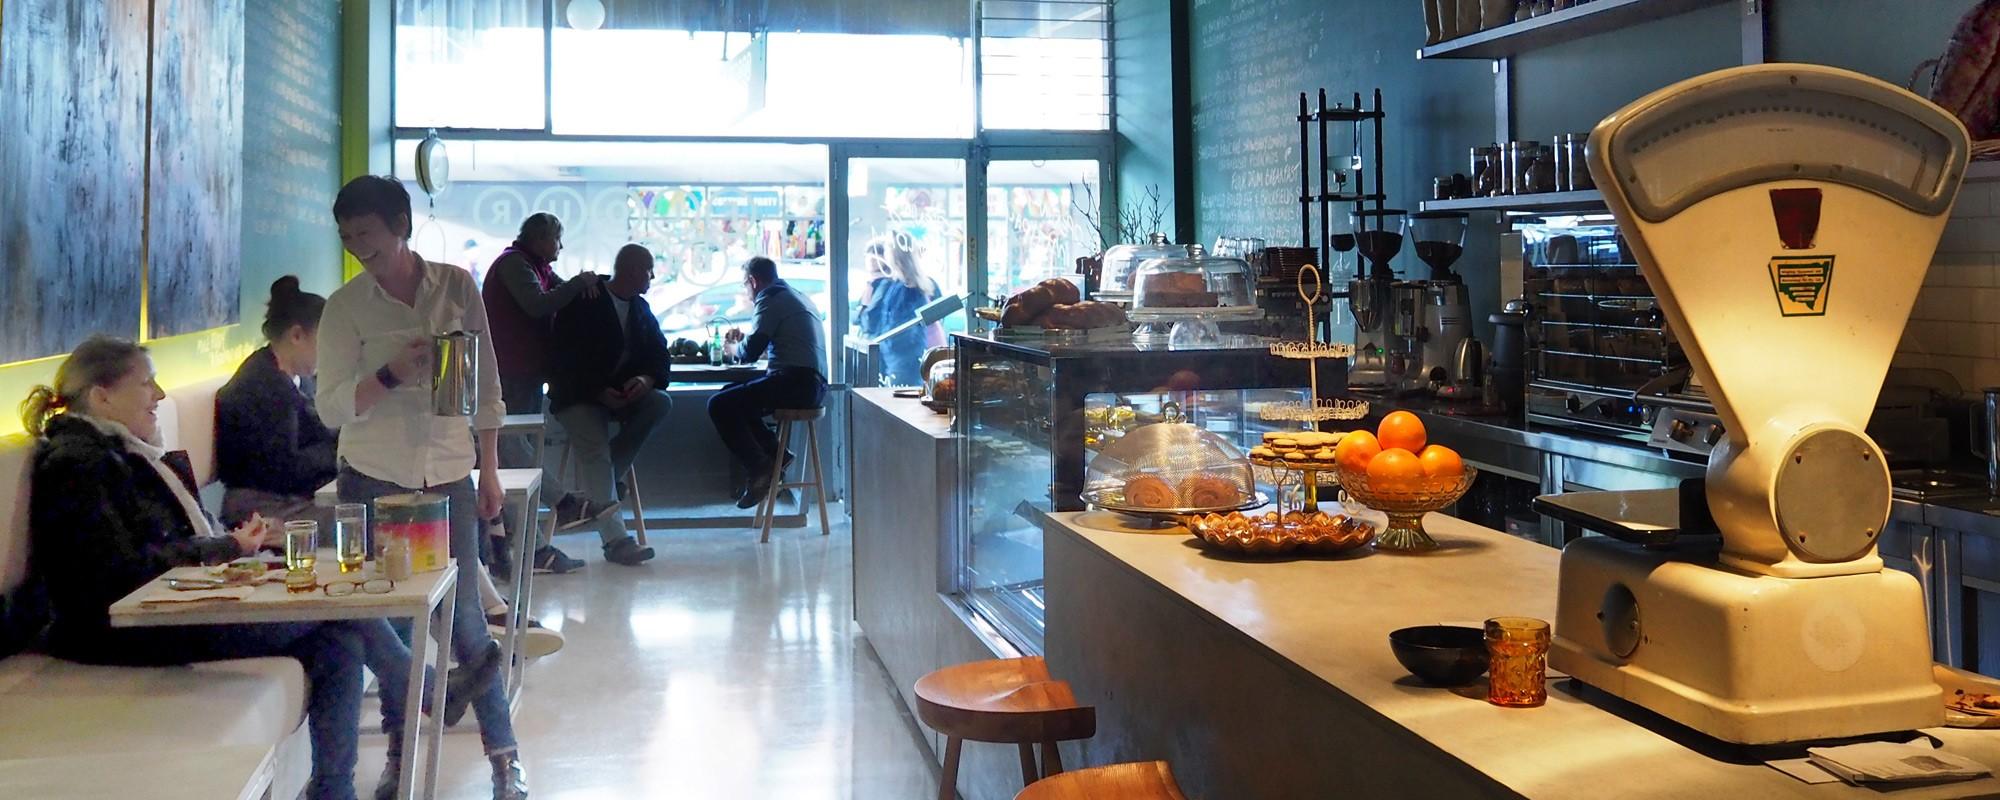 Cafe6 (1)